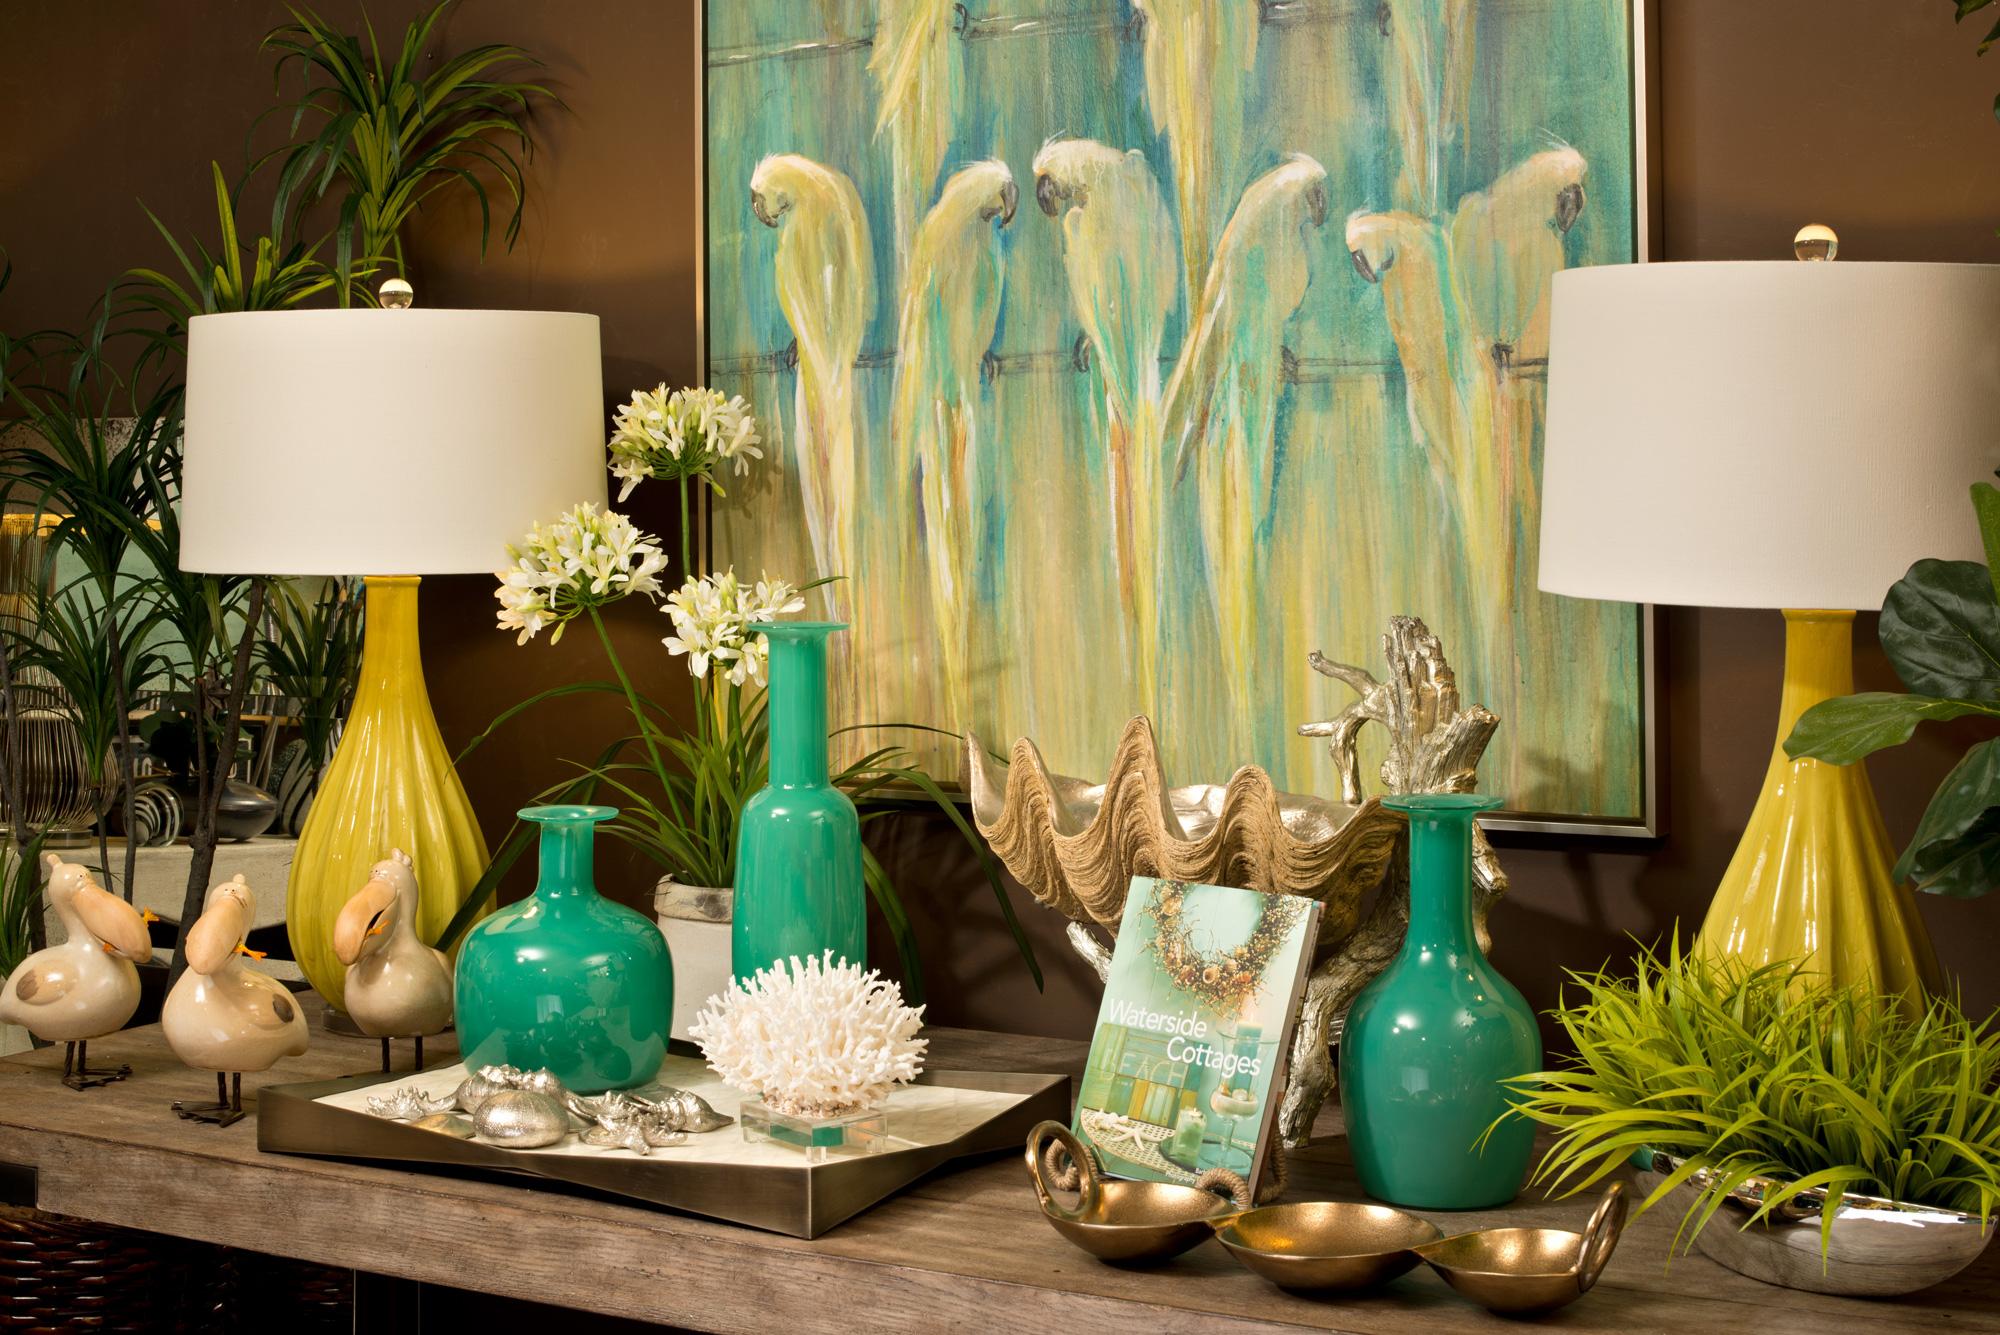 naples furniture stores home decor peach tree designs